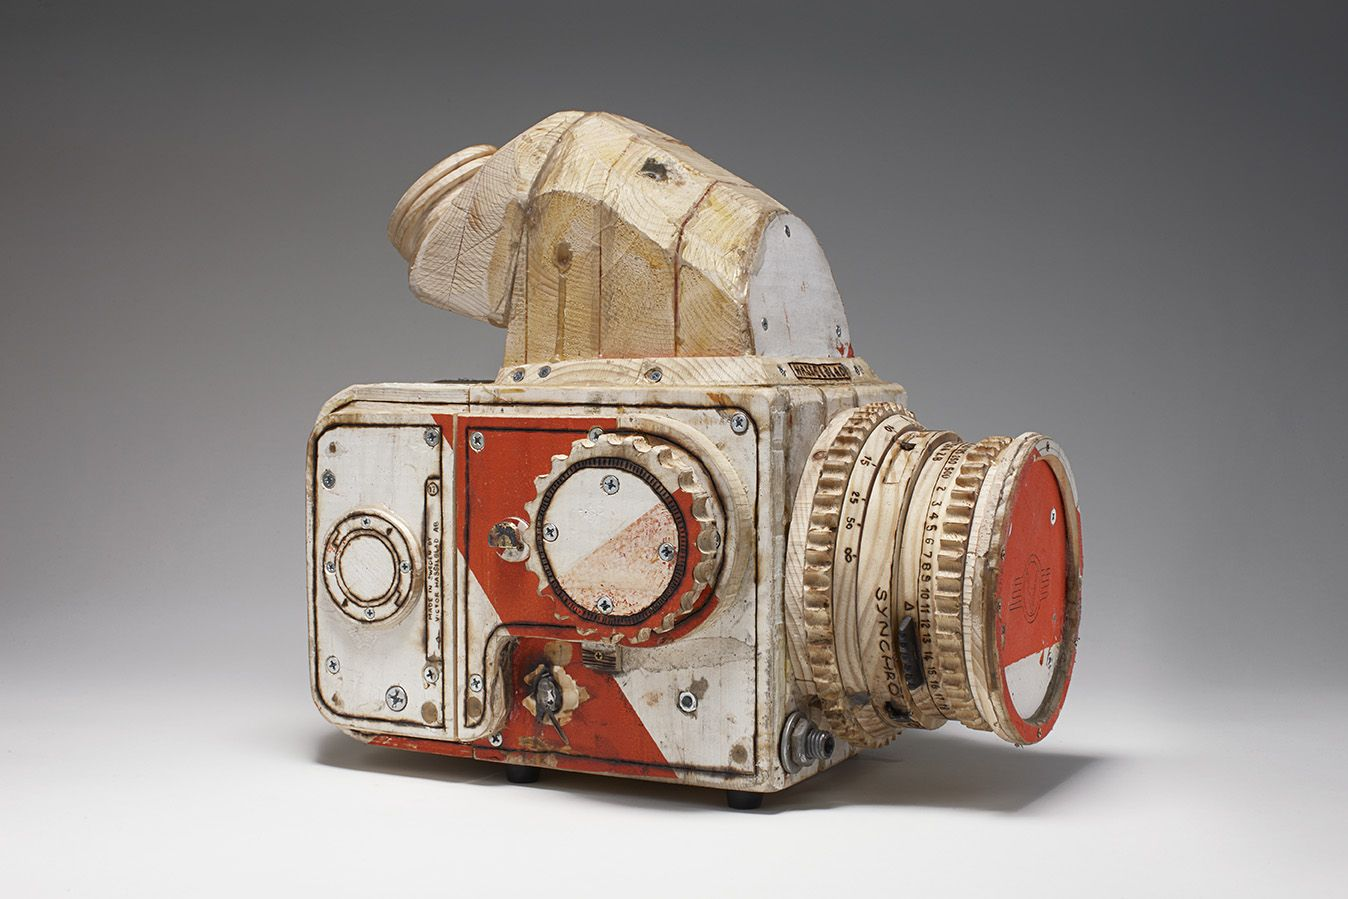 Tom Sachs, Cameras, Aldrich Contemporary Art Museum, Ridgefield, CT, 2009